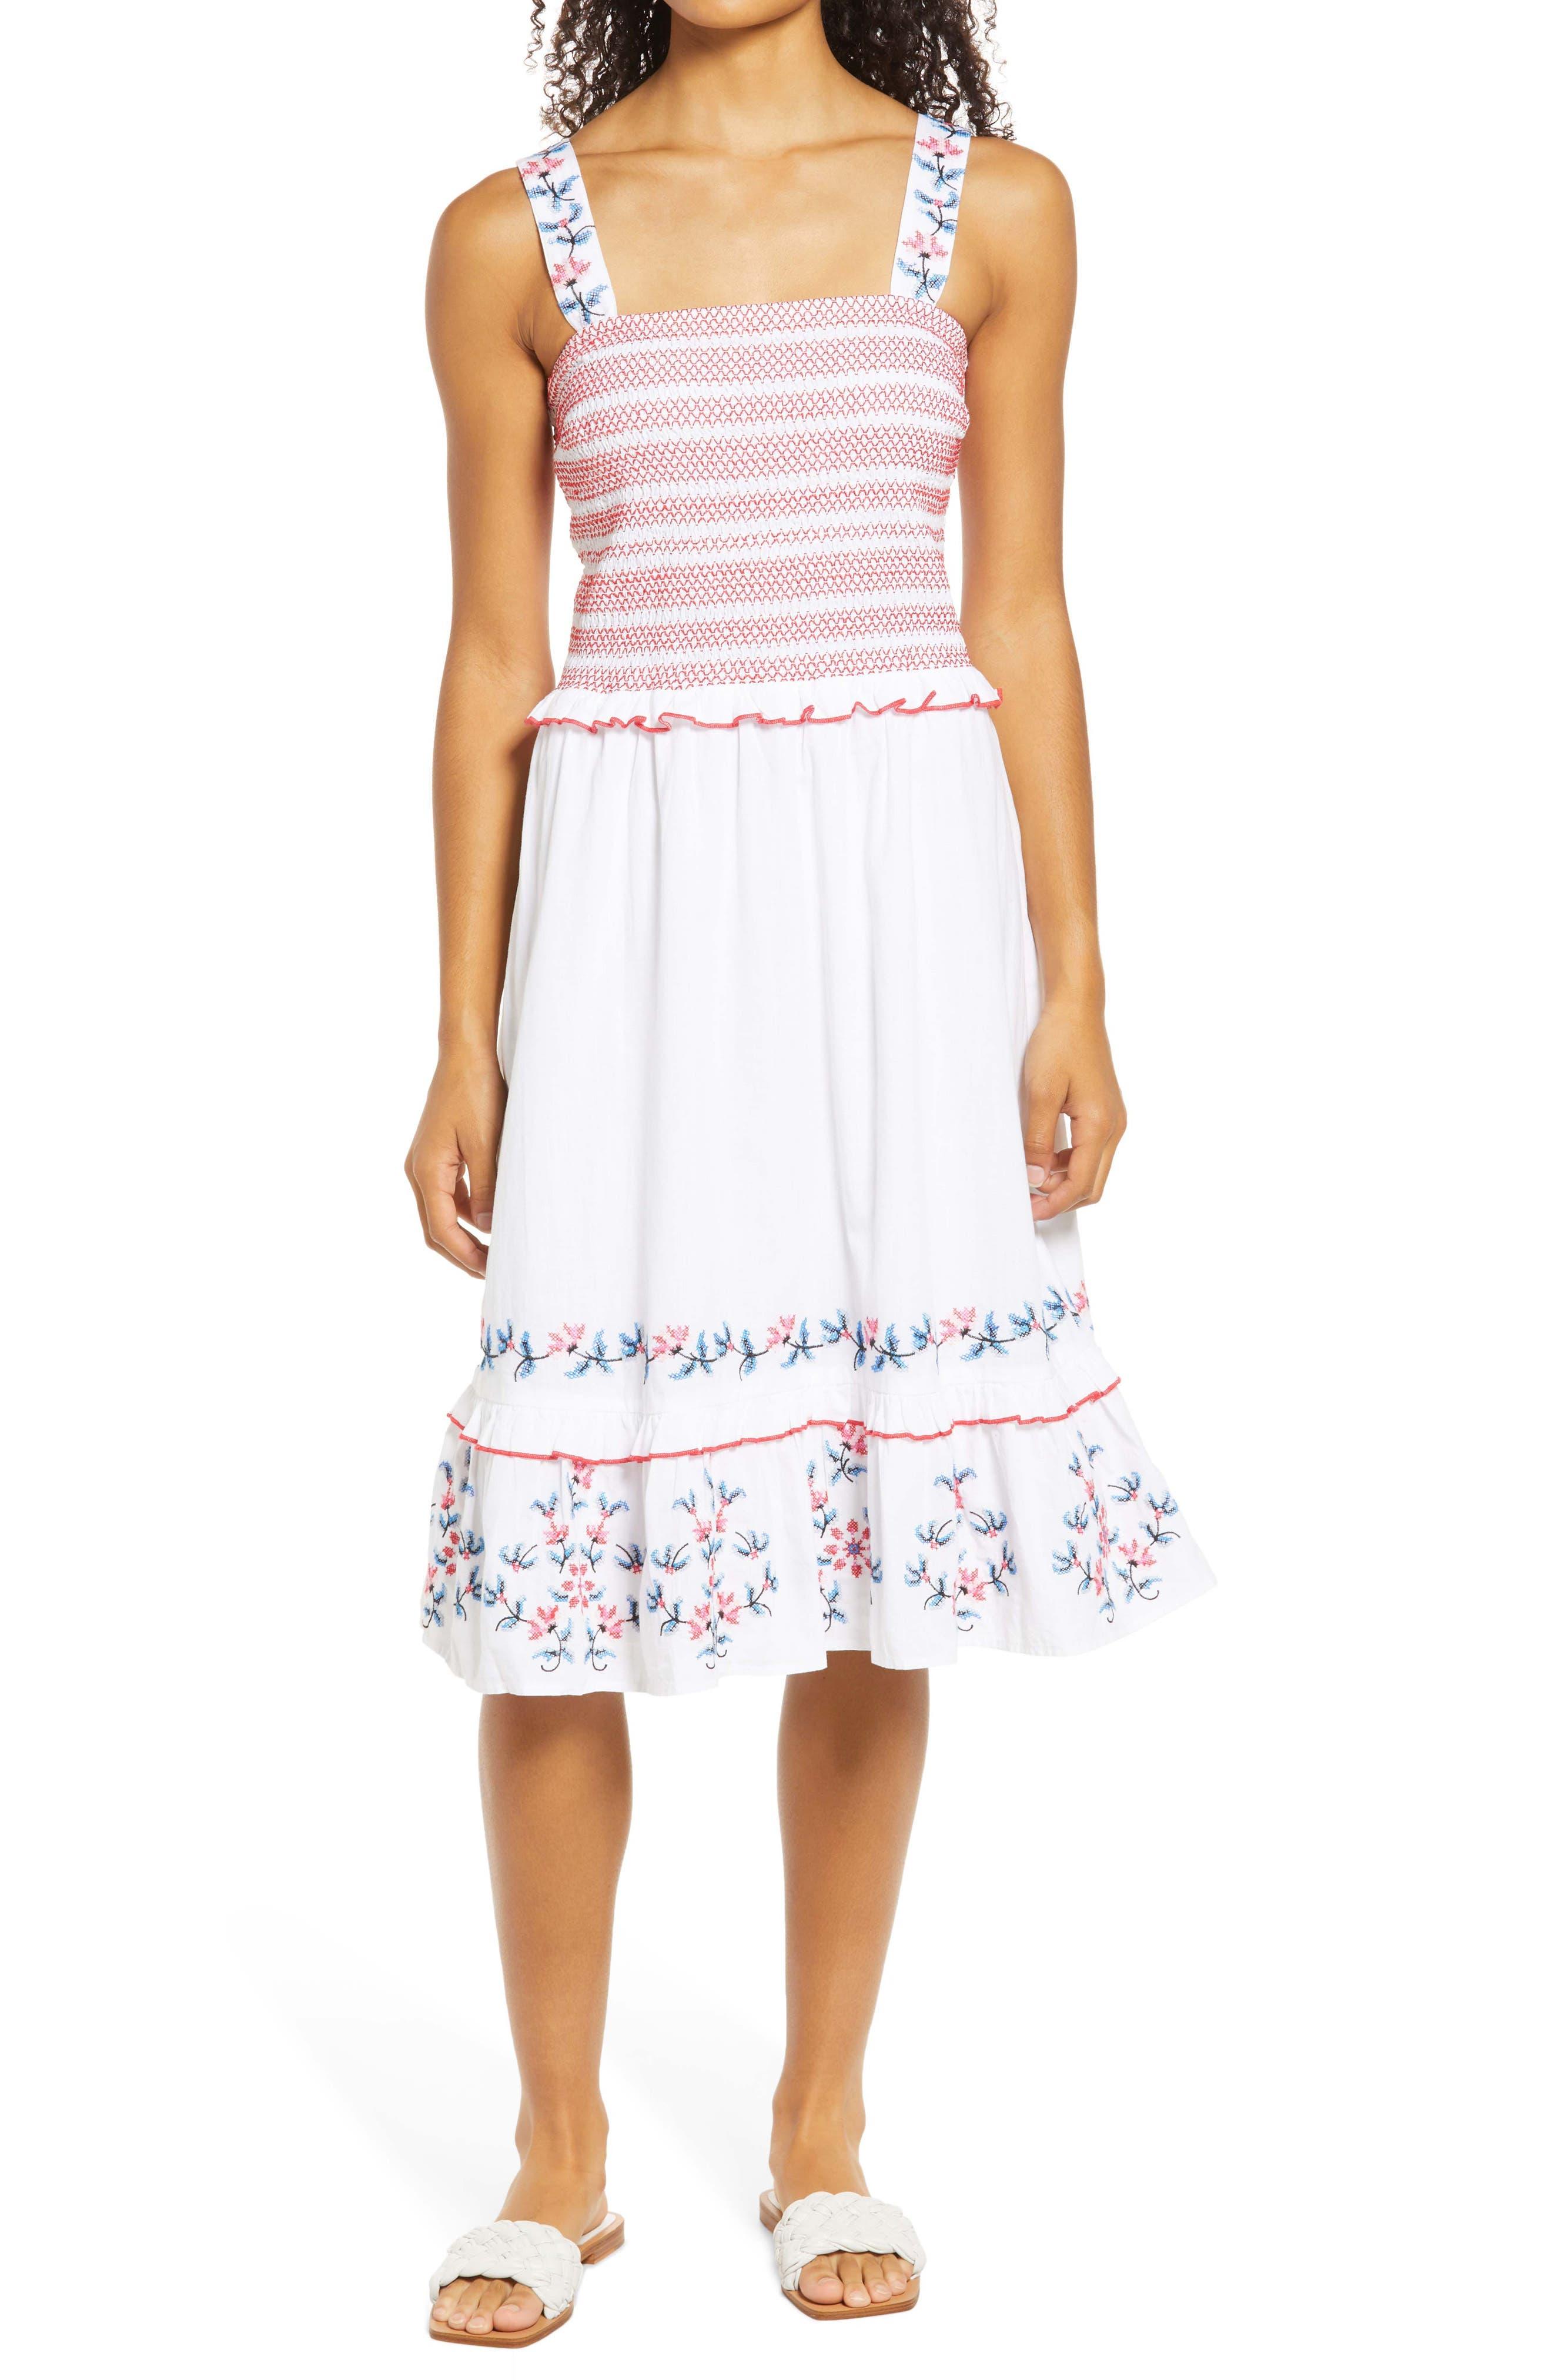 Taylor Smocked Sleeveless Dress